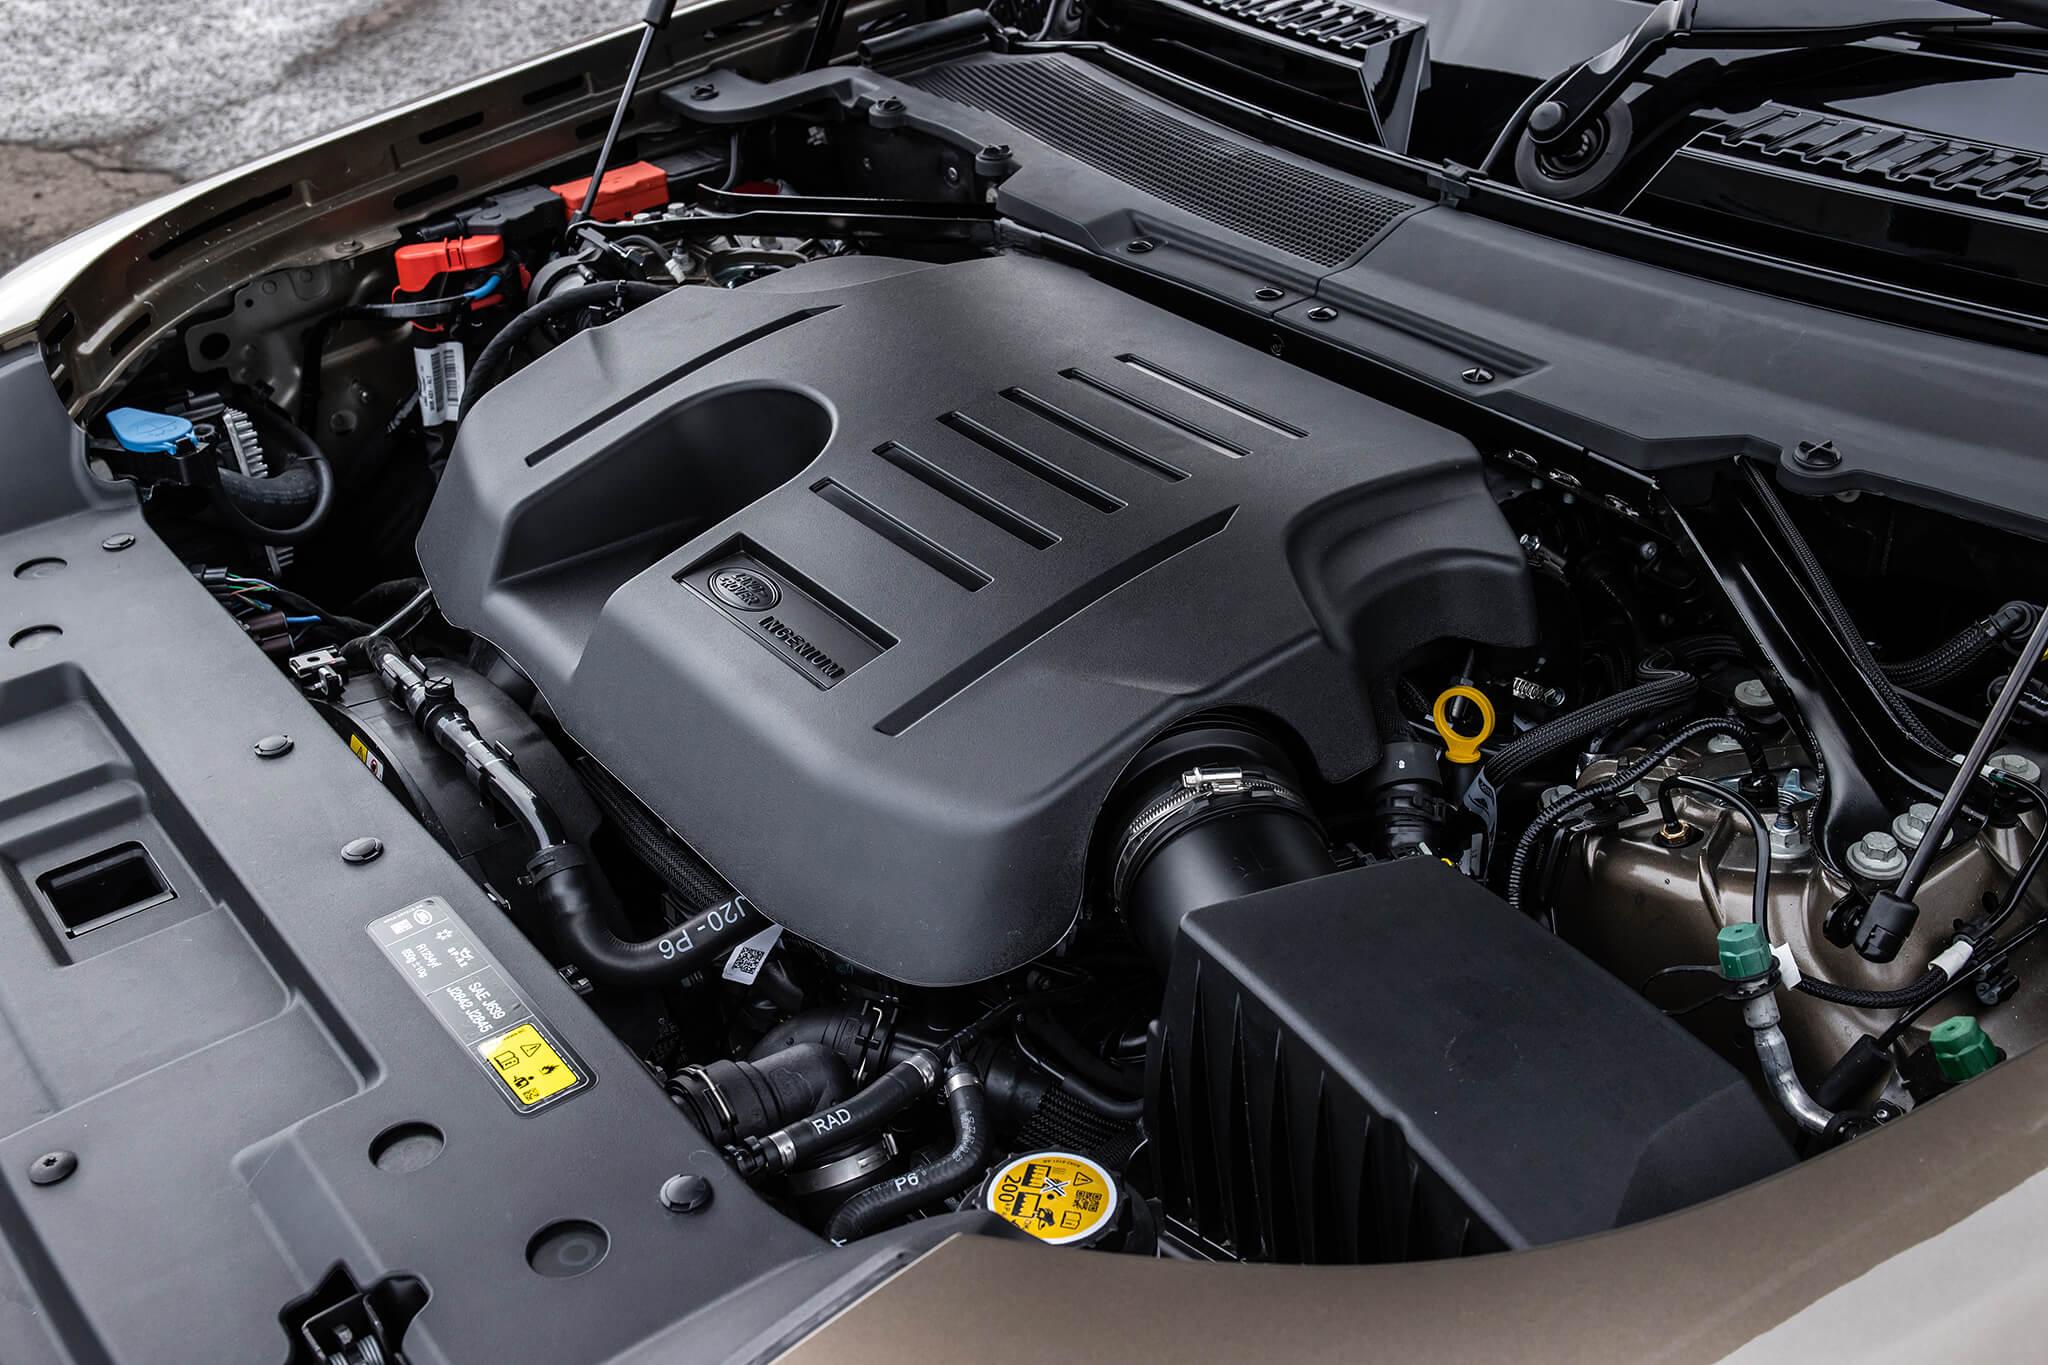 Motor 3.0, 6 cilindros, 400 cv